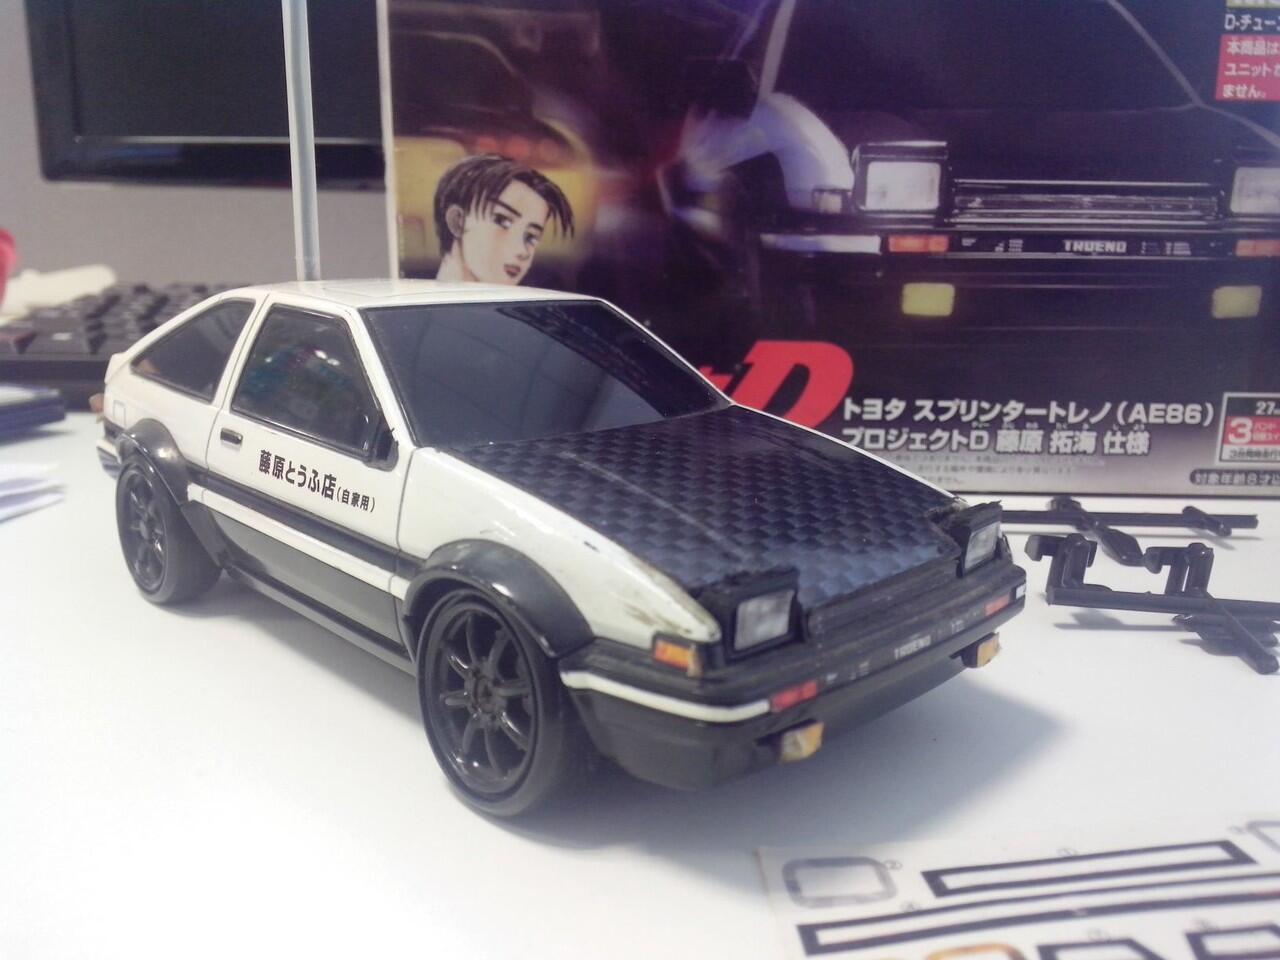 TTDPL Trueno AE86 Initial D version - 2nd full set- mantaaab gann